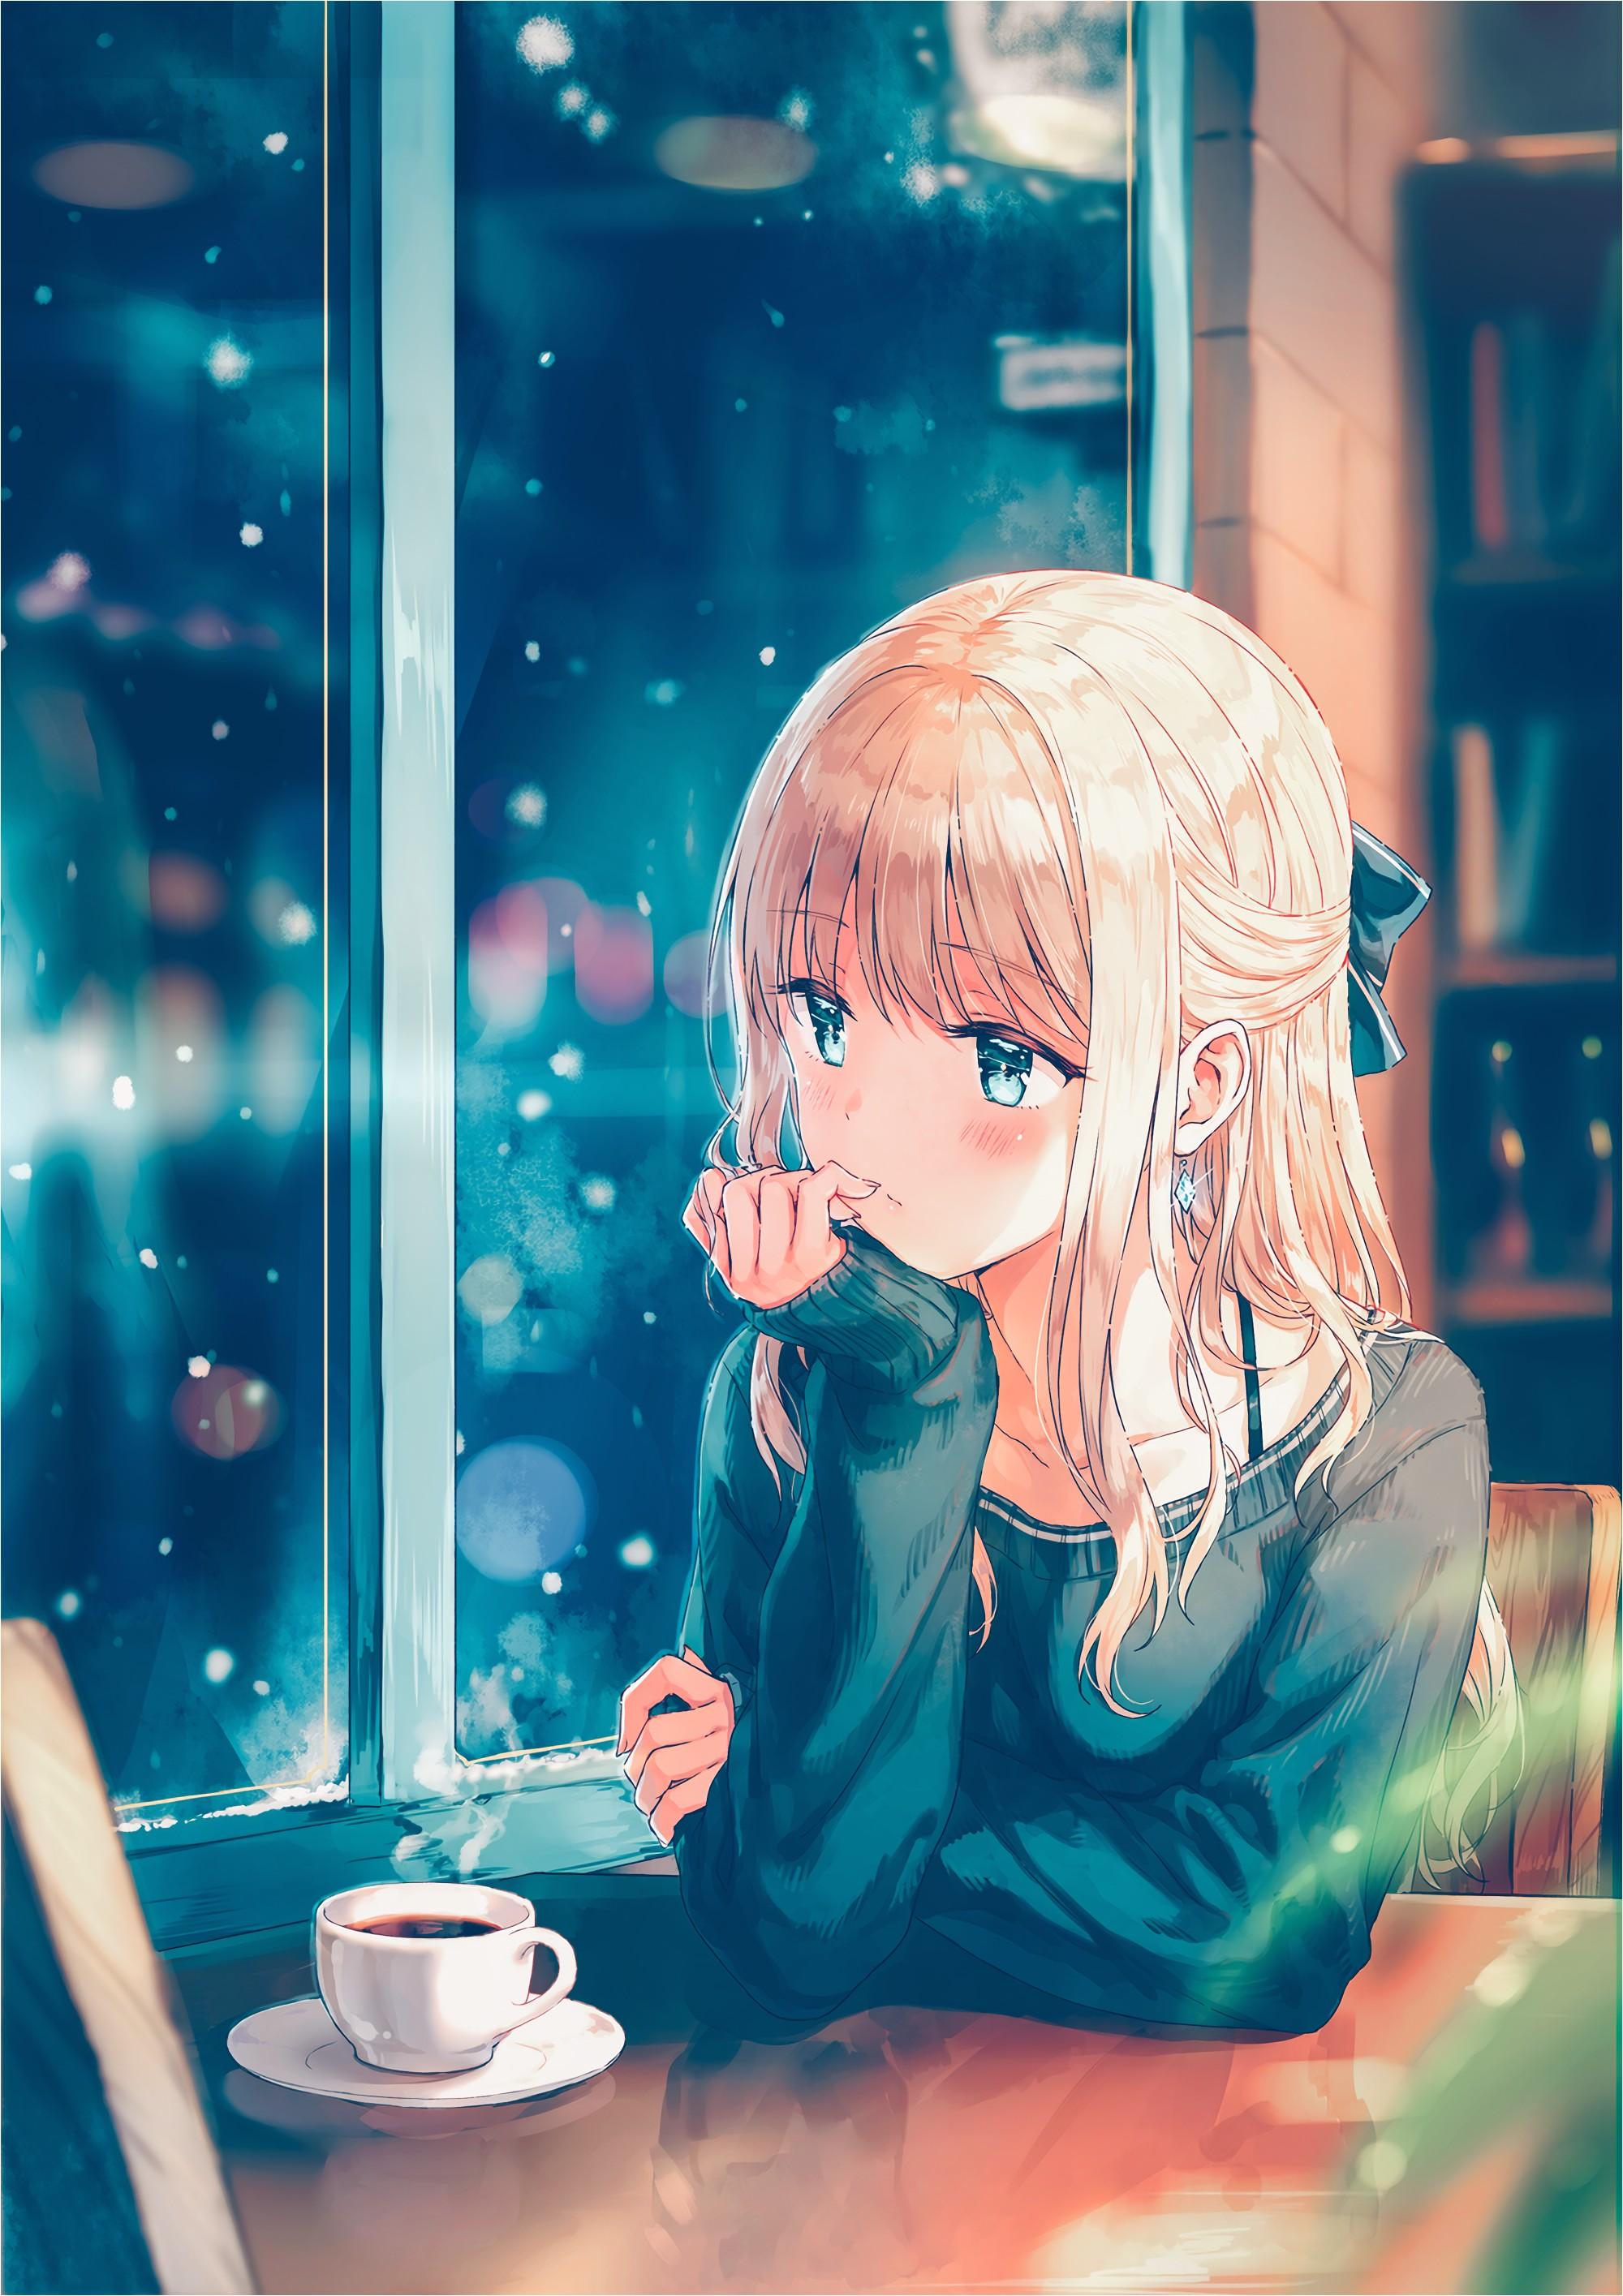 Anime 2000x2830 anime anime girls long hair blonde sweater snow aqua eyes coffee